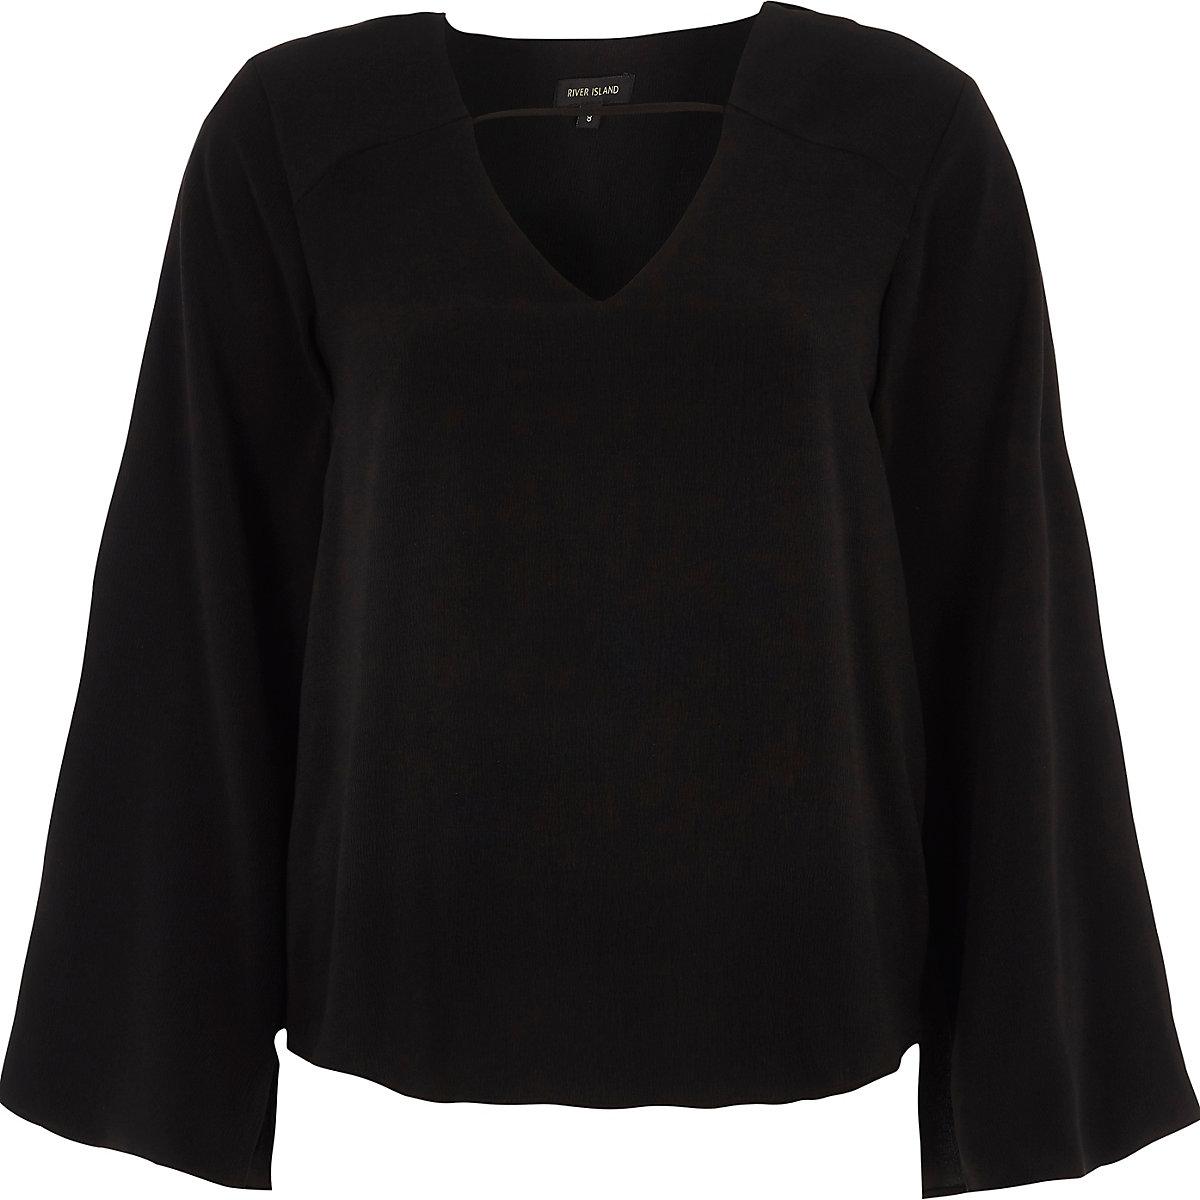 Black twist back long sleeve top